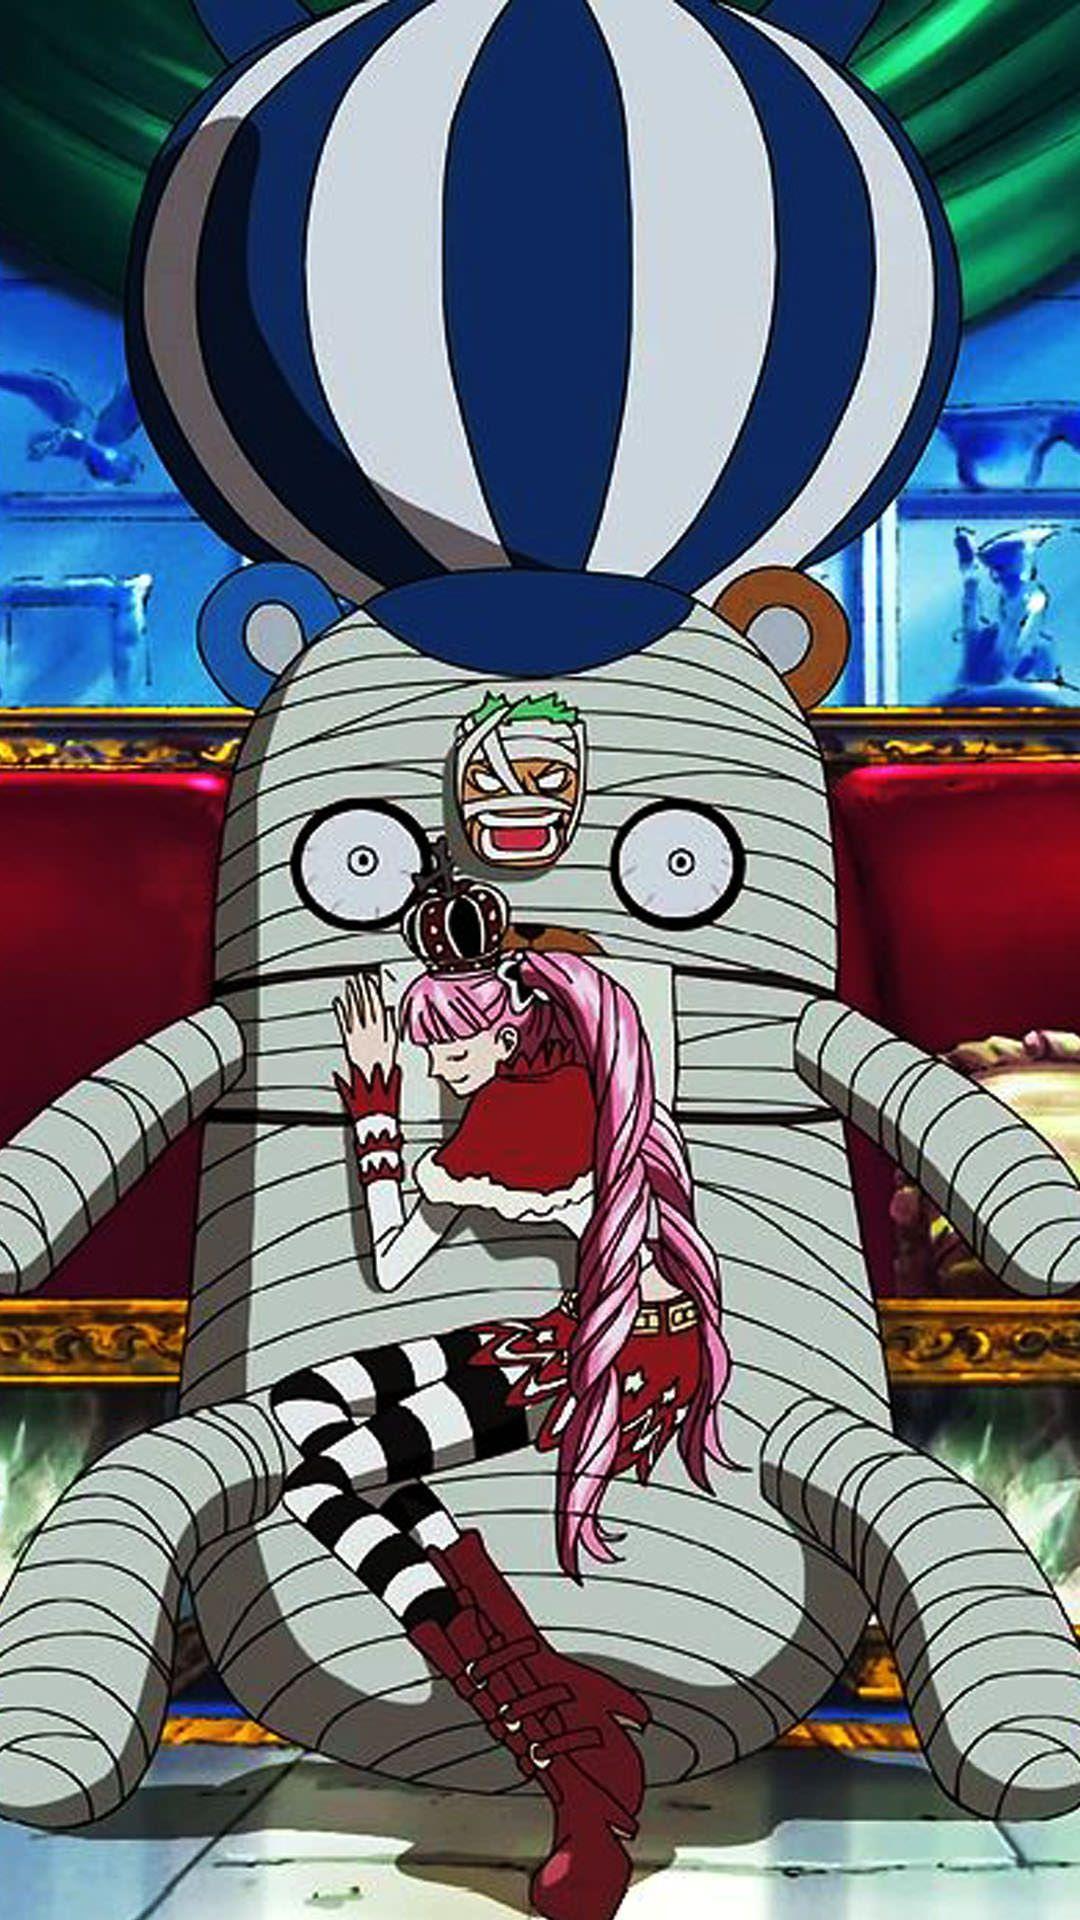 Perona wallpaper 43 | One piece anime, One piece series, One piece manga